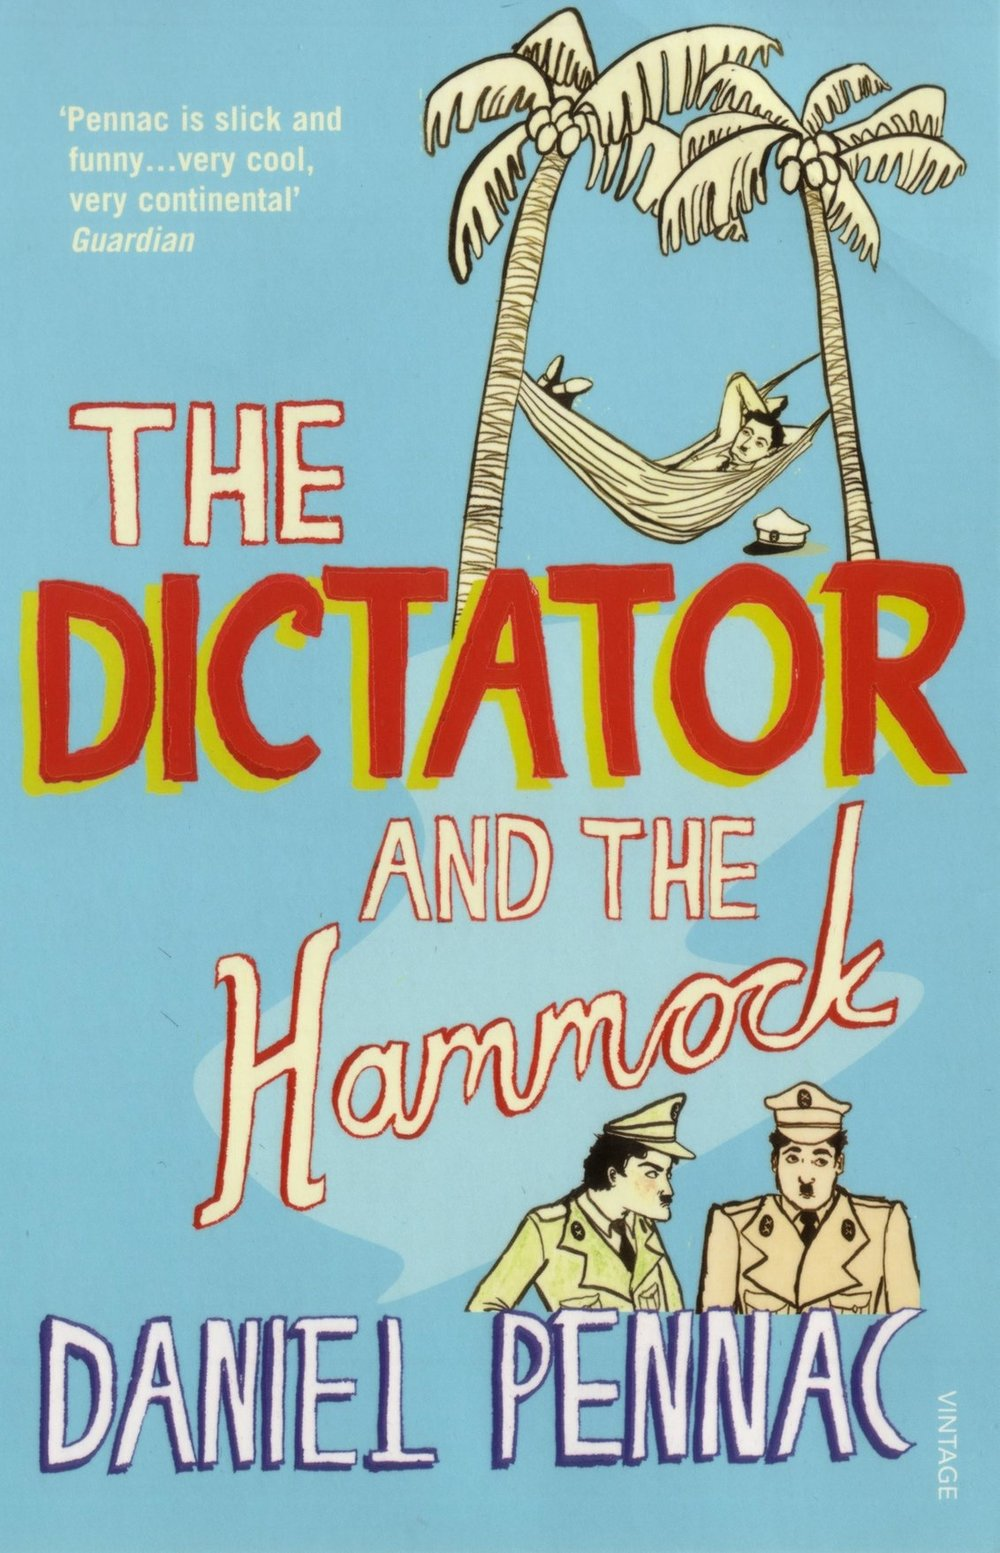 Dictator-book-jacket.jpg